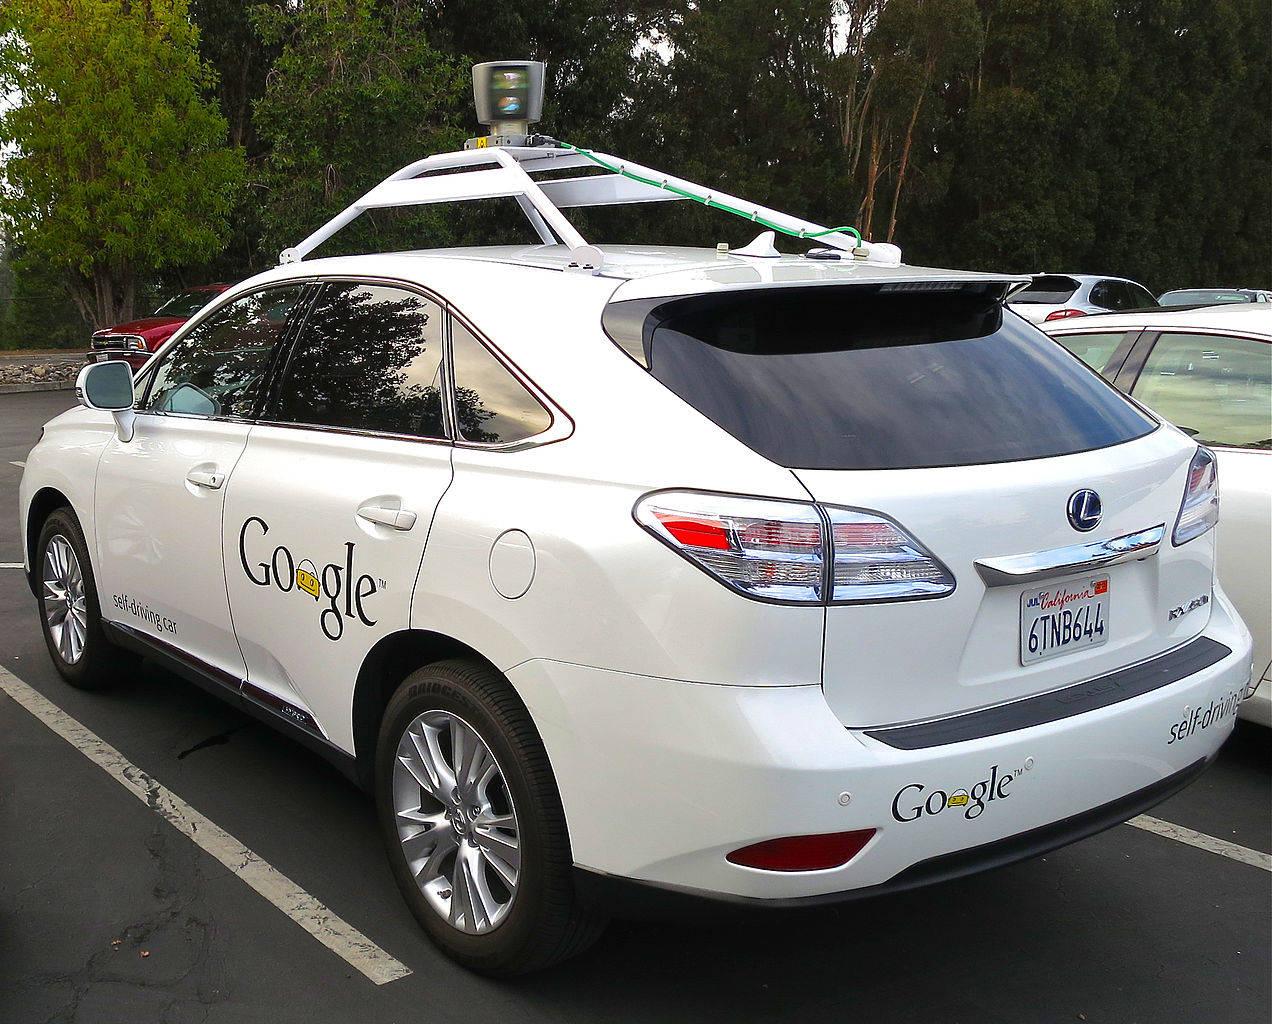 waymo: Google-bred Waymo aims to shift robotic cars into